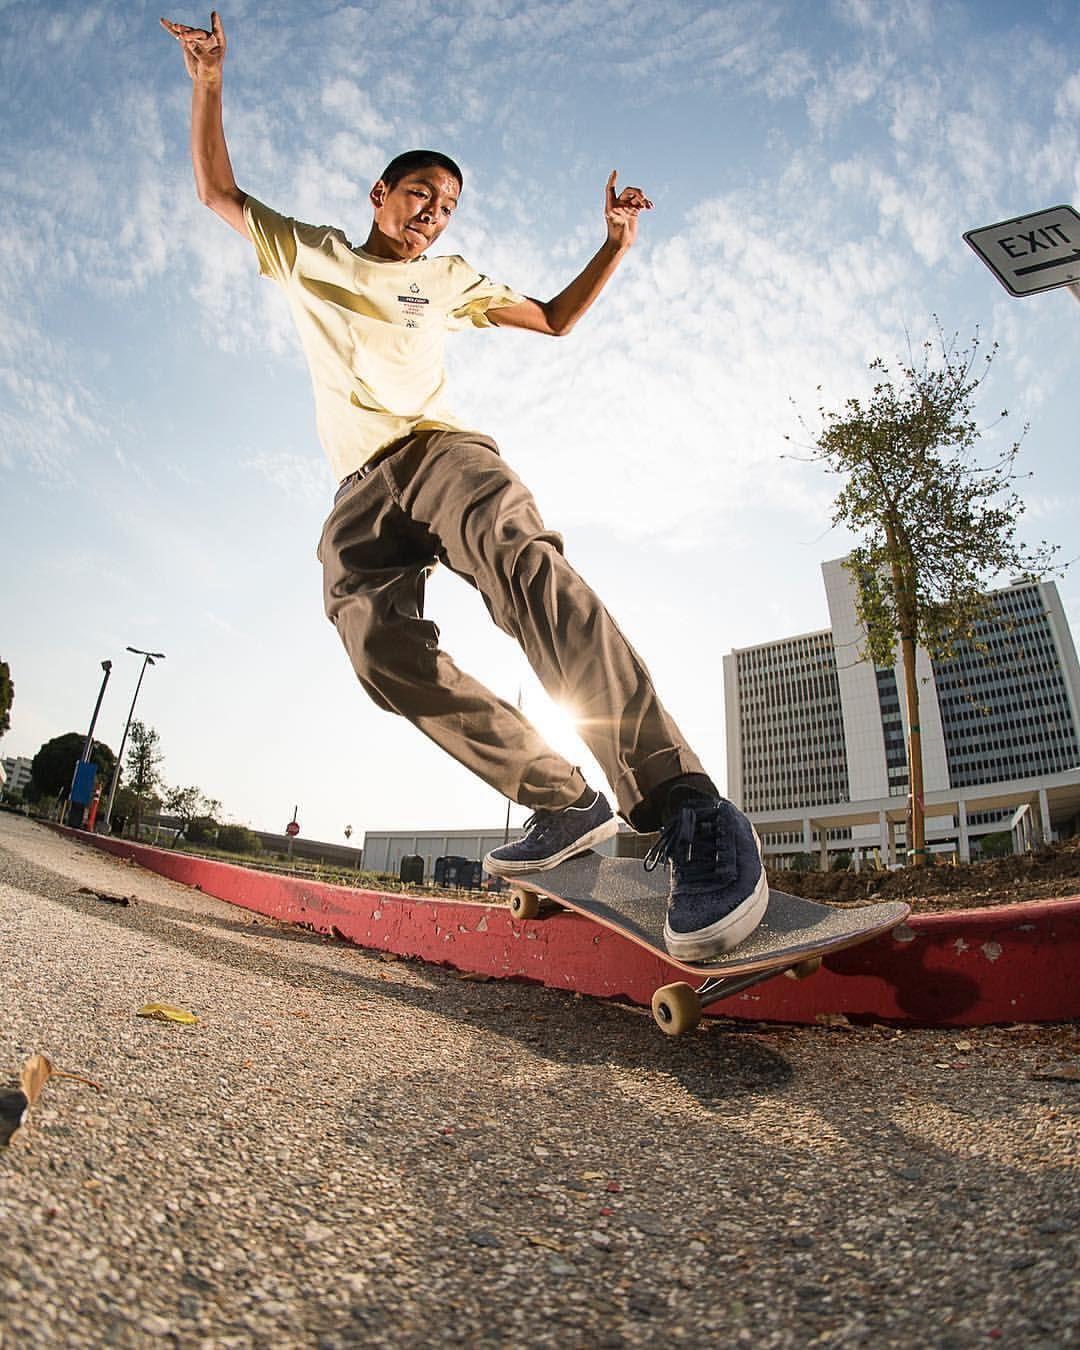 Ll Louielopez Sur Instagram Slappybsmith Atibaphoto Skateboard Skateur Skate